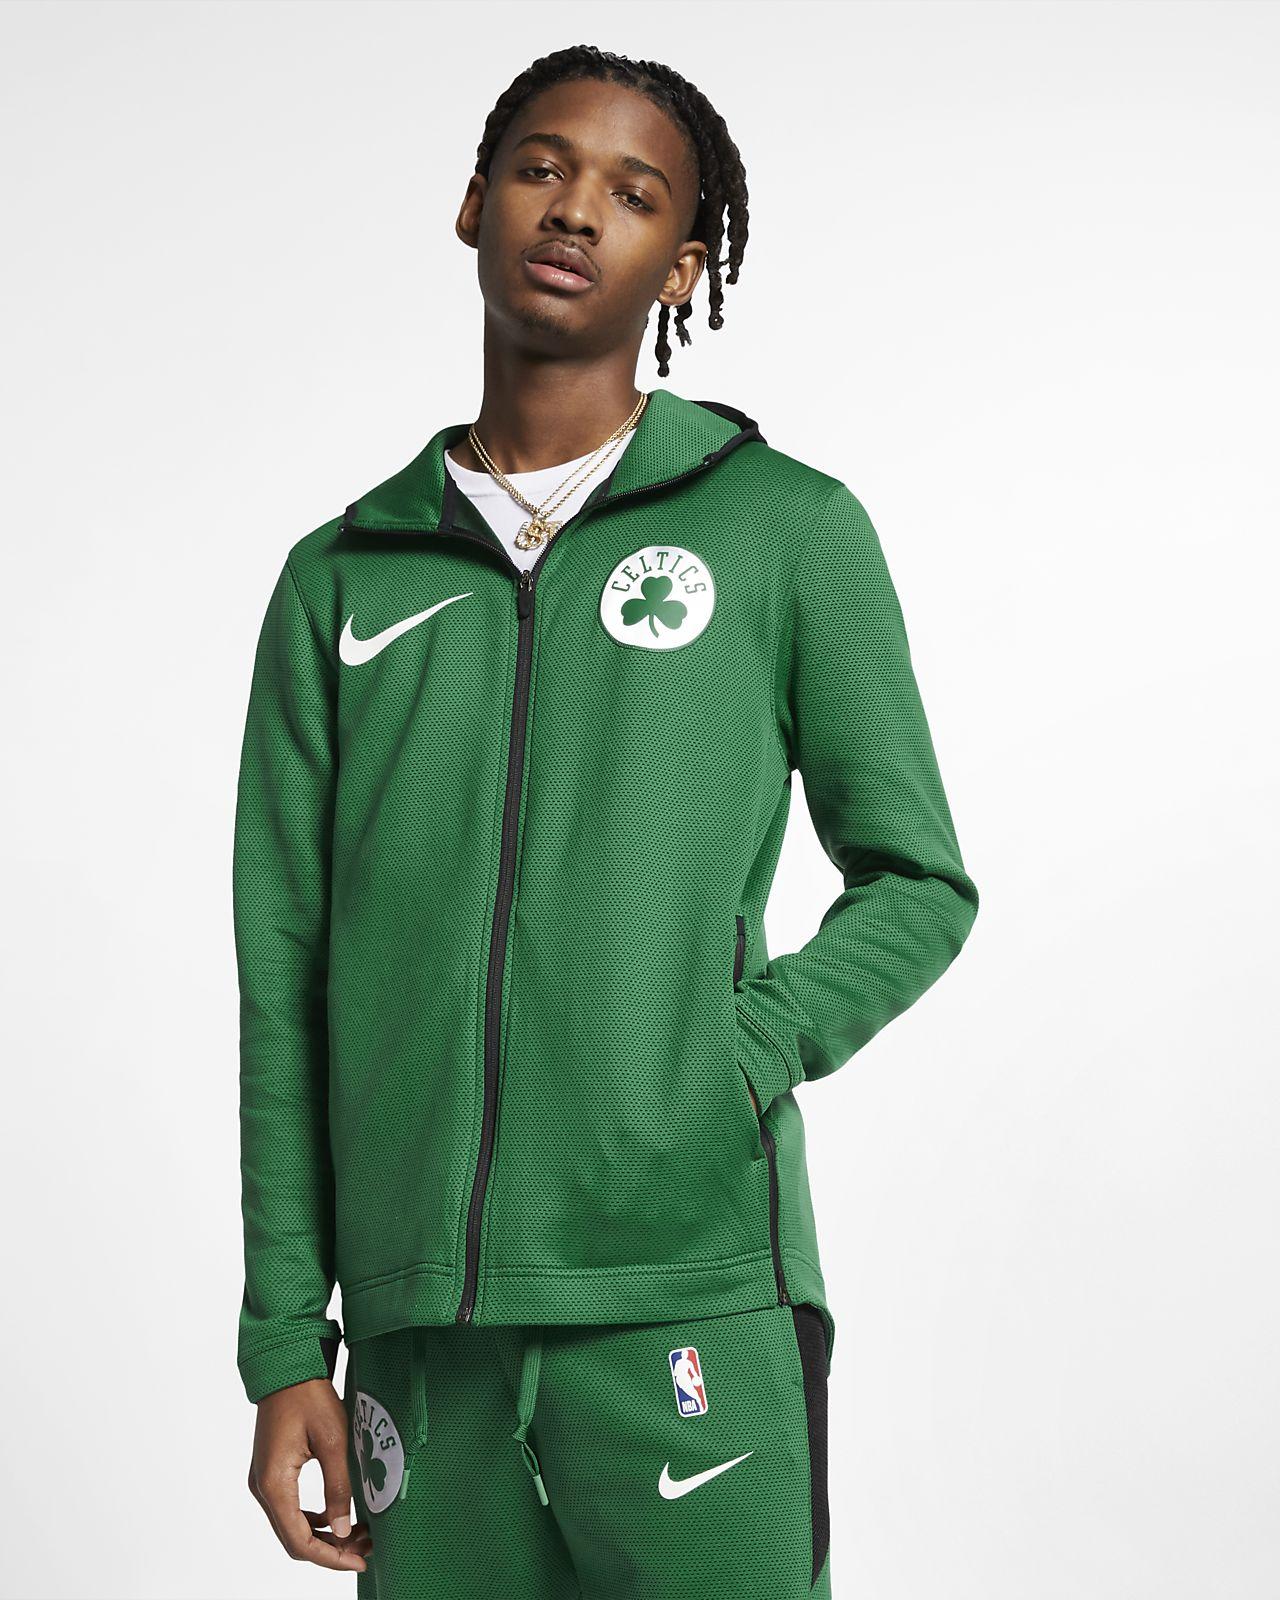 35f5a51a40a Boston Celtics Nike Therma Flex Showtime Men's NBA Hoodie. Nike.com